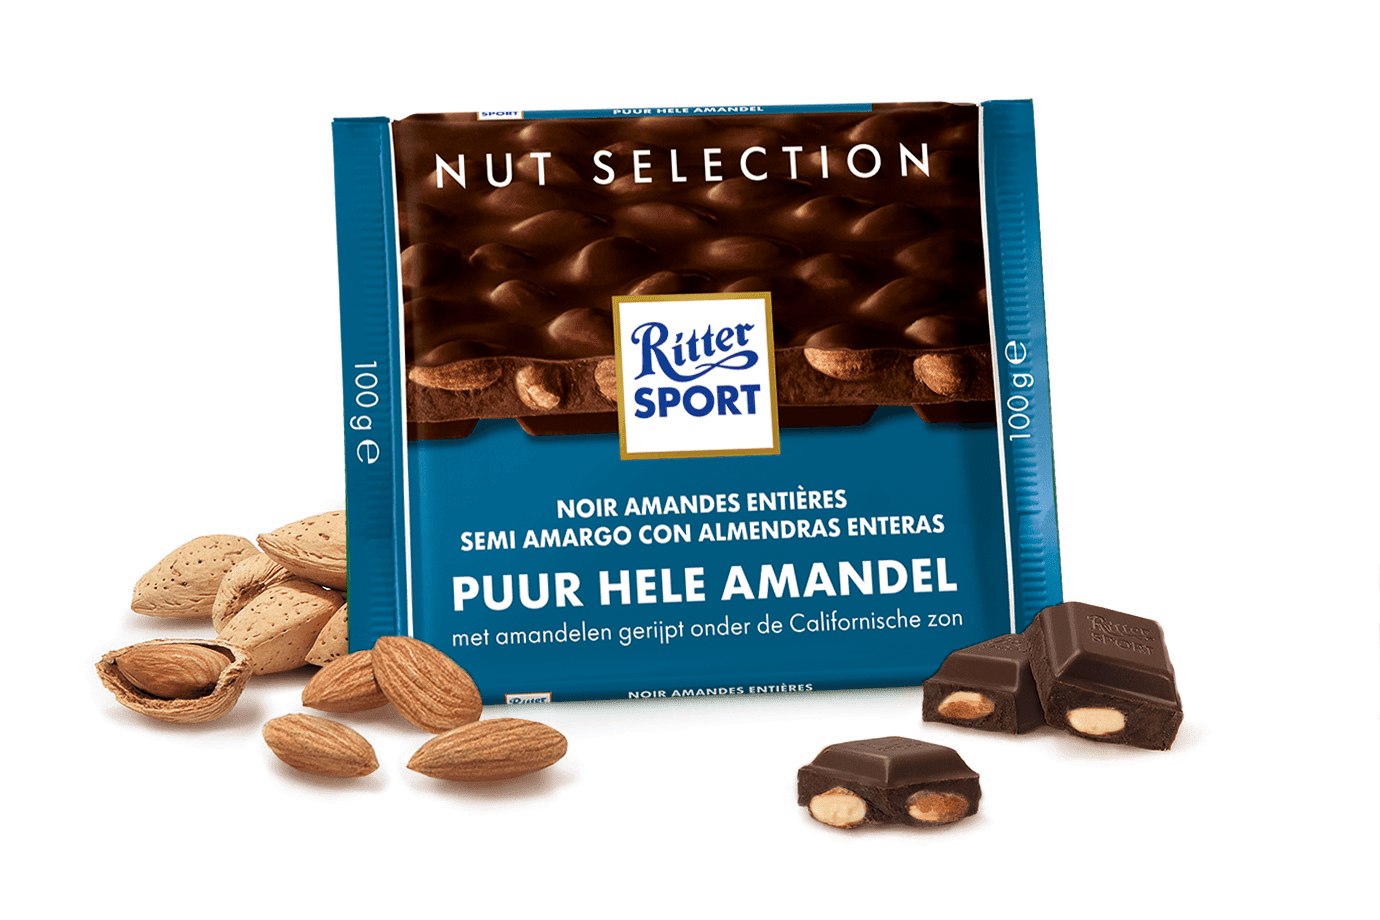 Ritter sport nut selection